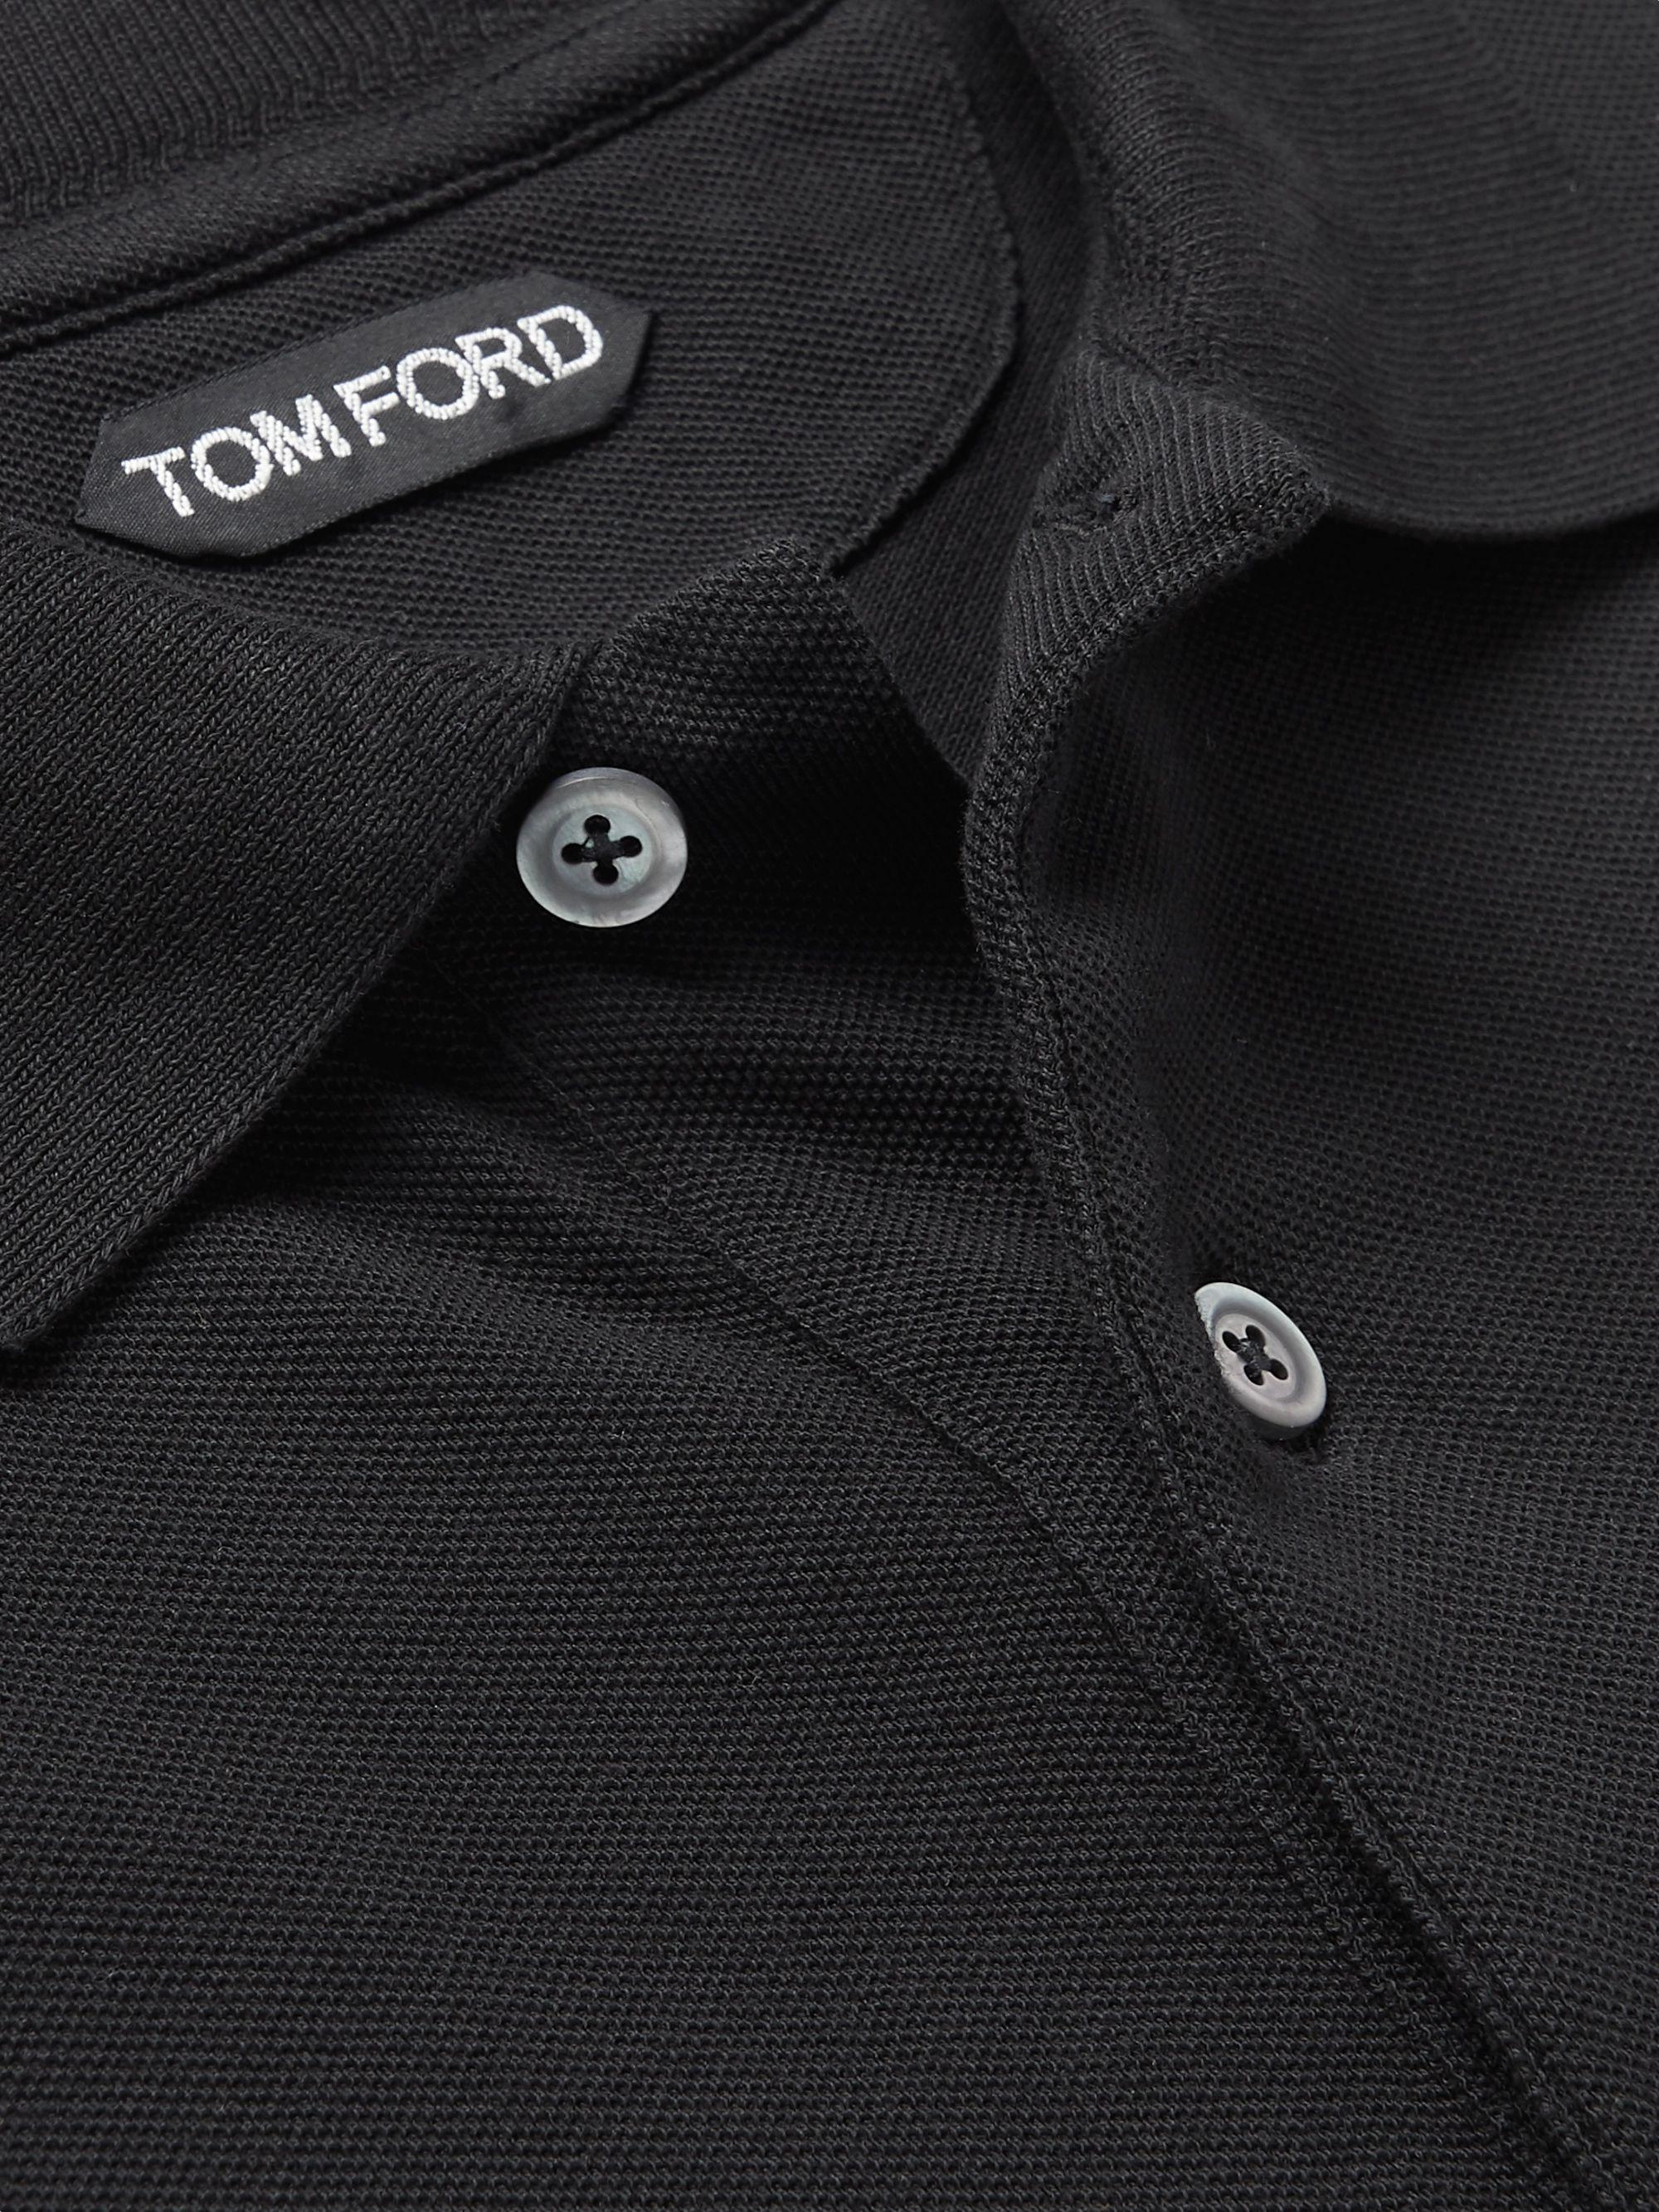 Black Slim-fit Cotton-piqué Polo Shirt | Tom Ford